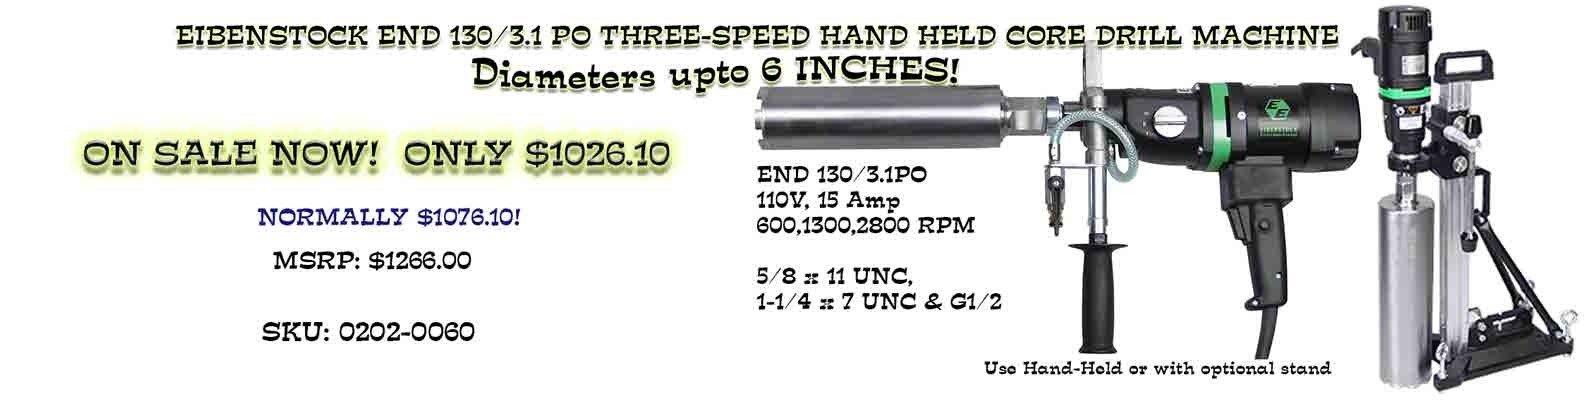 View this Eibenstock 3-Speed Special!